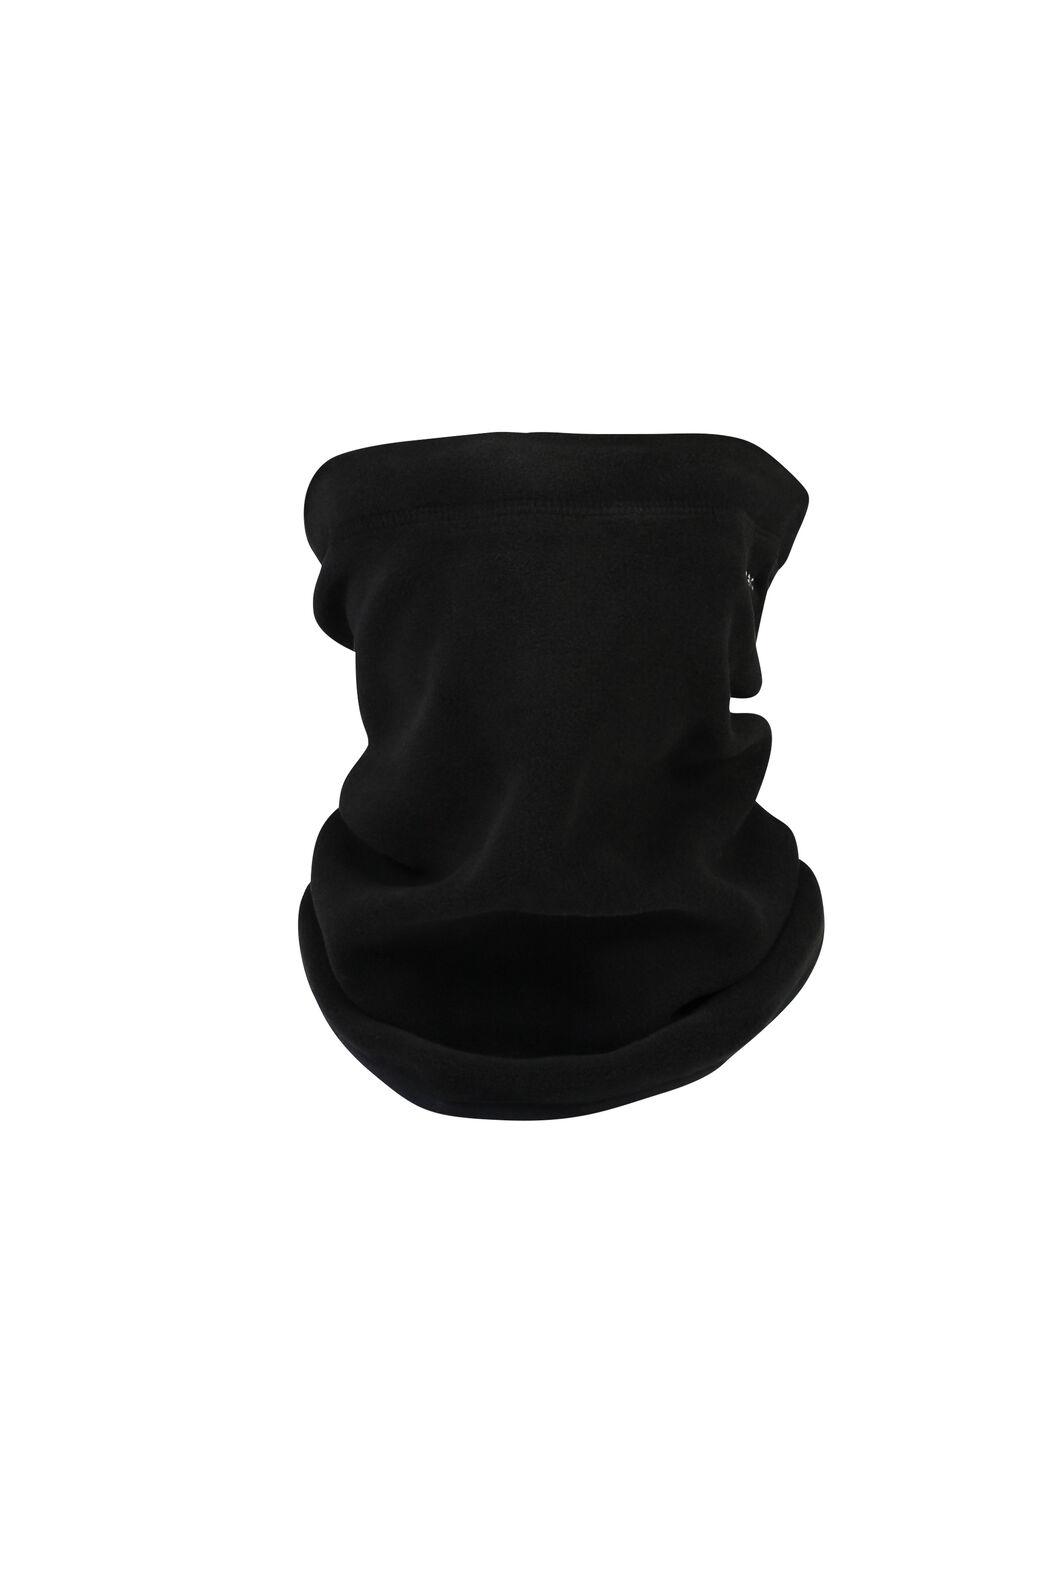 Macpac Kaka Polartec® Micro Fleece Neck Gaiter, Black, hi-res